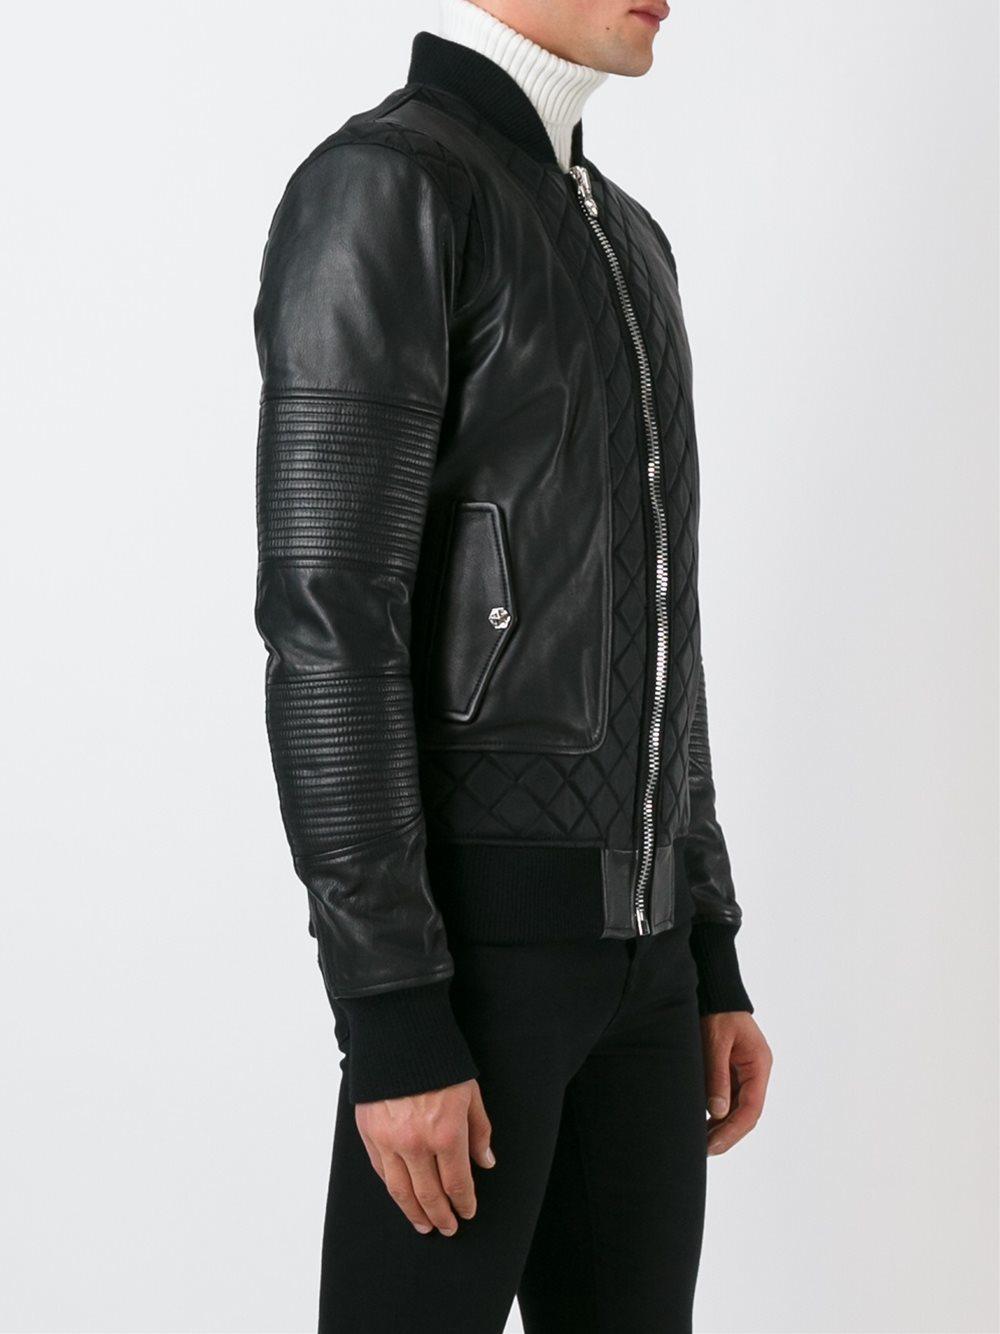 philipp plein leather bomber jacket in black for men lyst. Black Bedroom Furniture Sets. Home Design Ideas